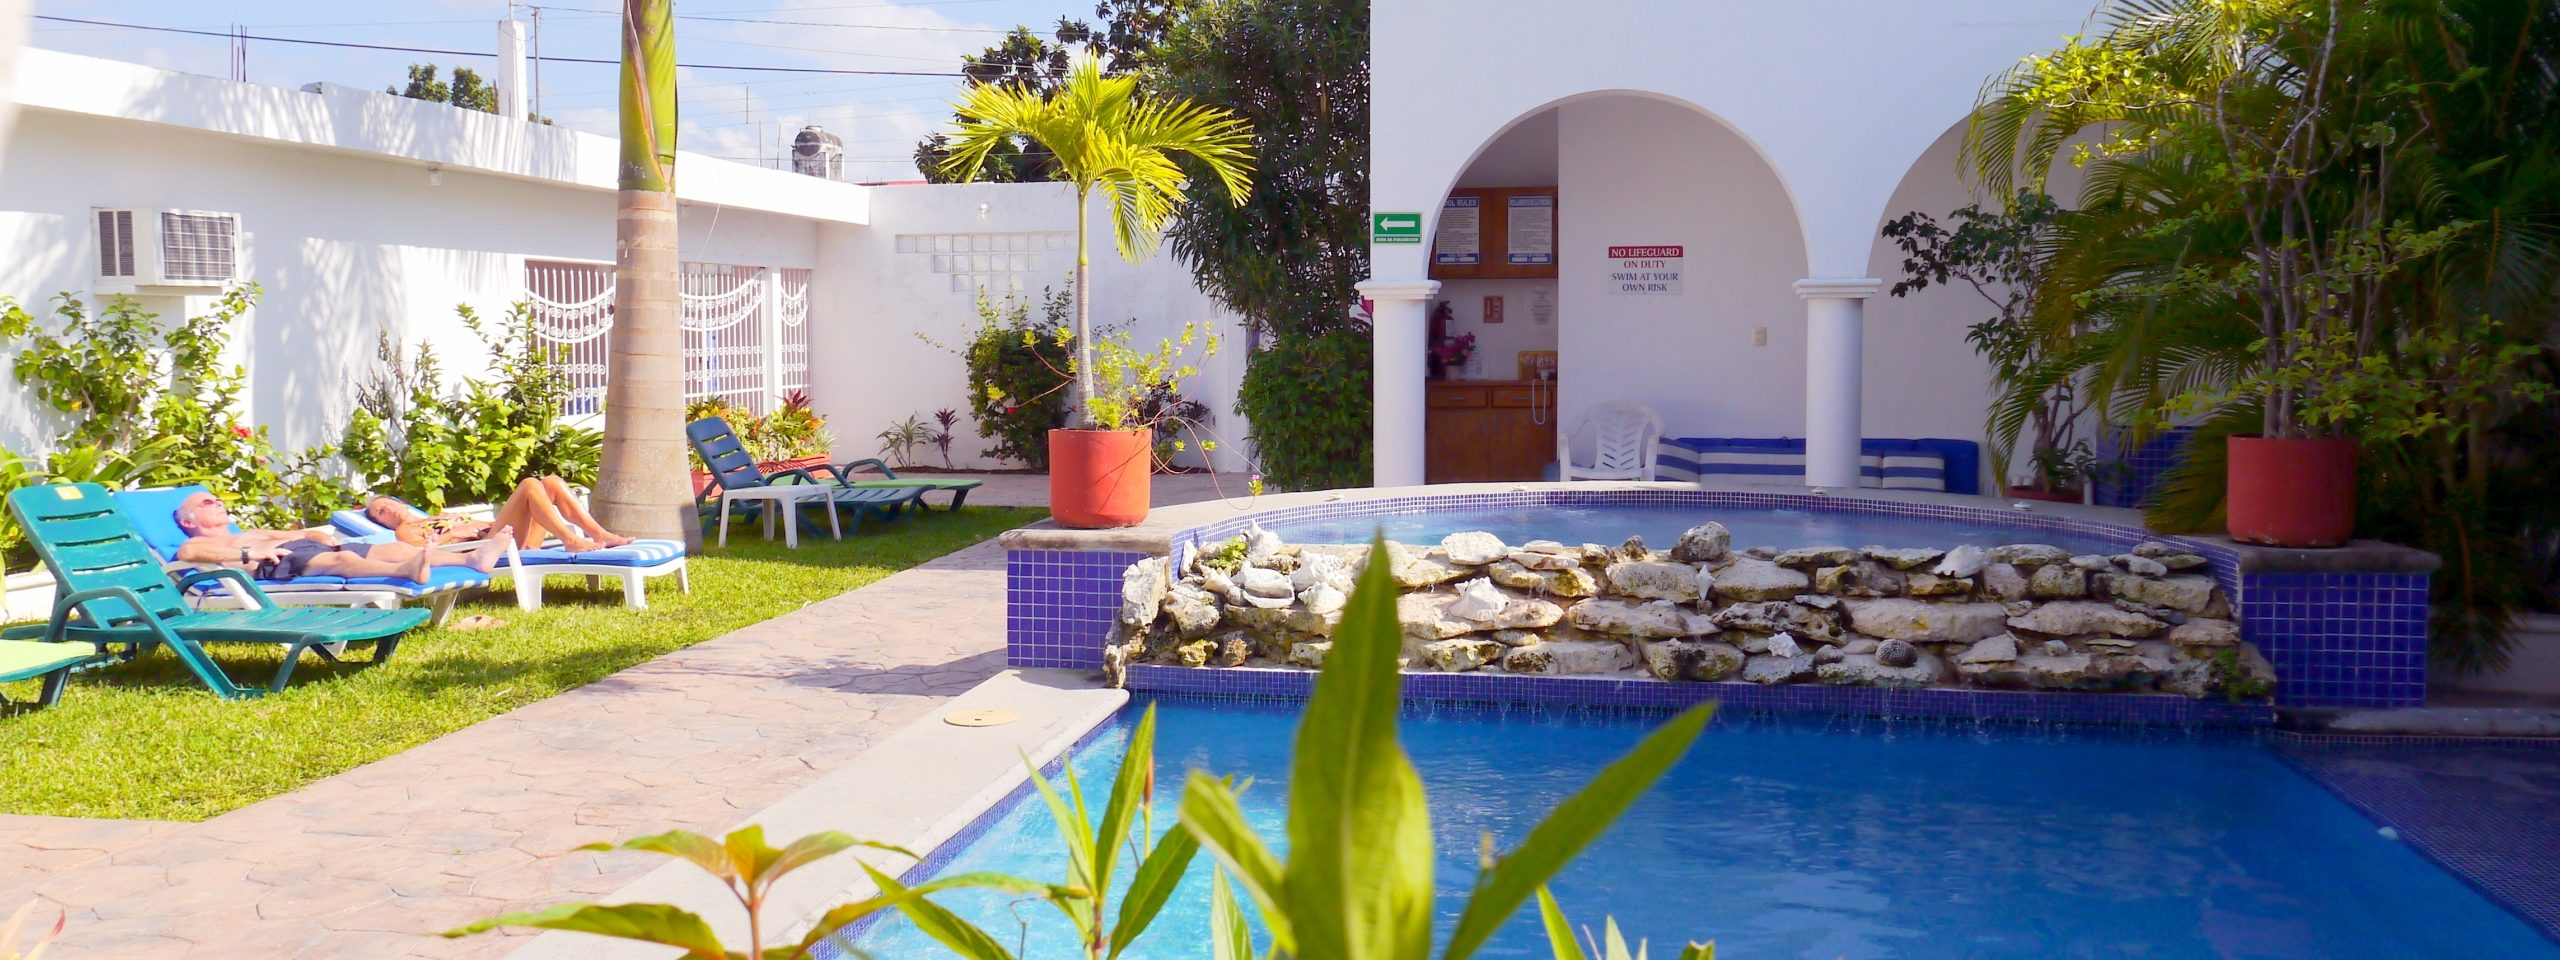 Cozumel vacation rental apartments